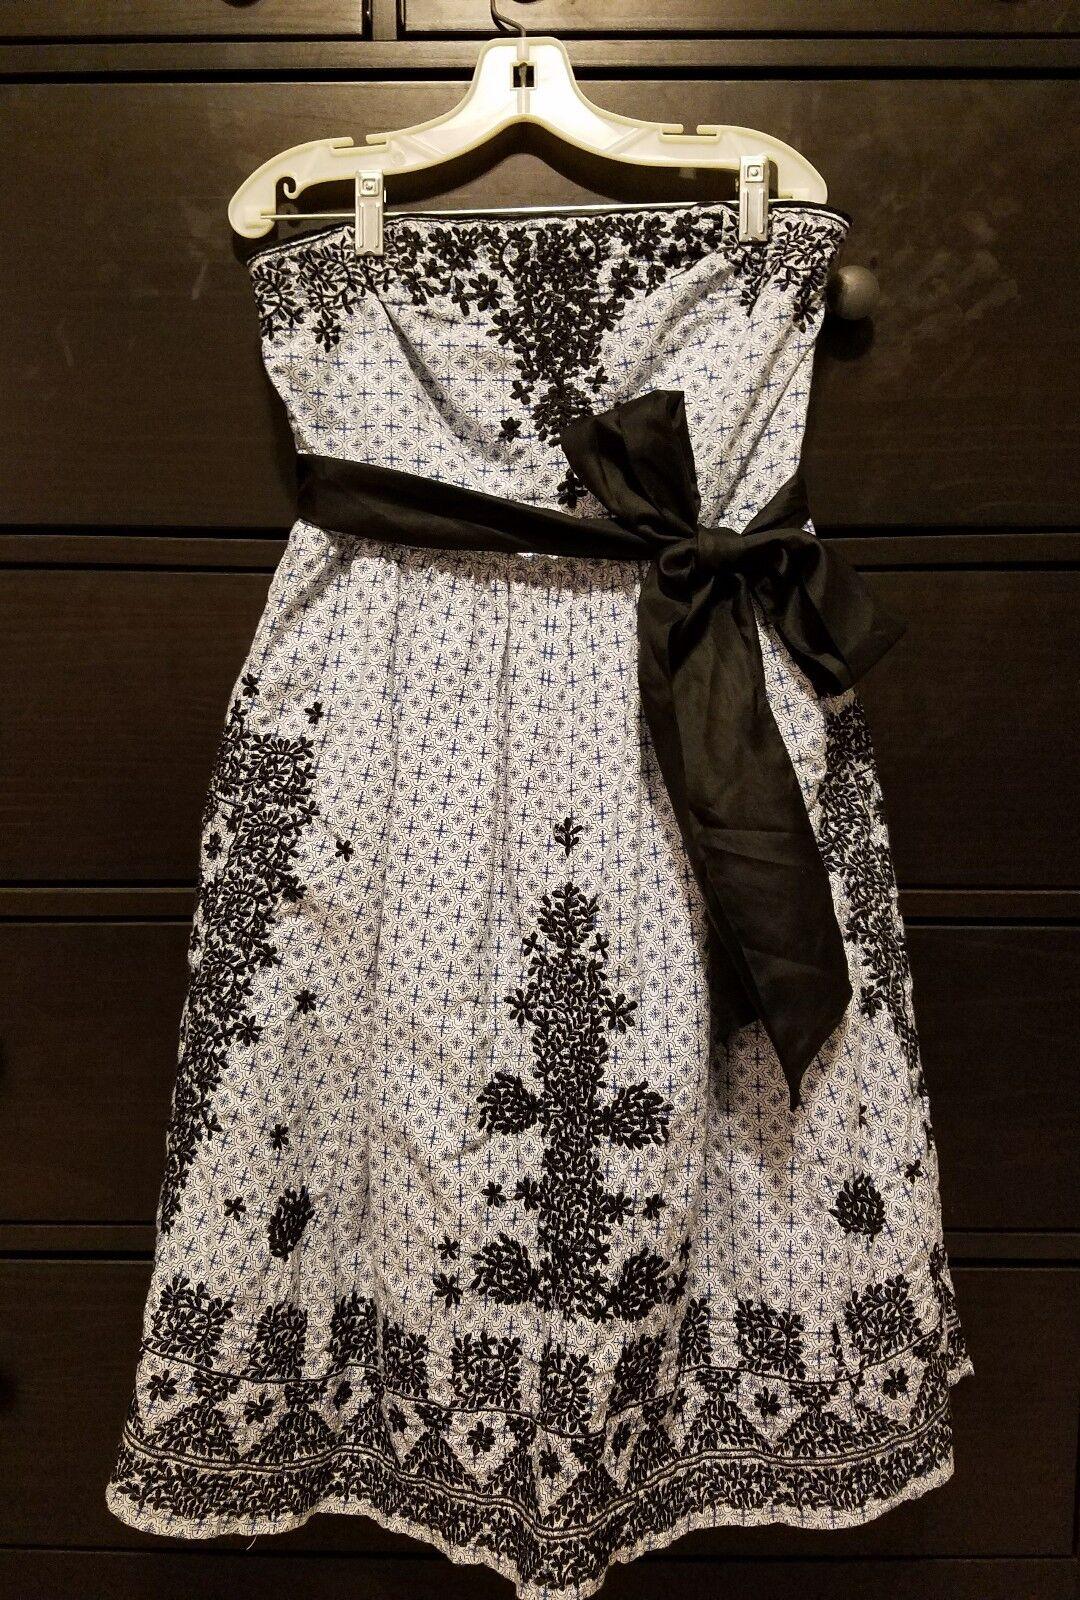 Anthropologie Moulinette Soeurs bluee Navy Embroidered Strapless Dress Sash Sz 4